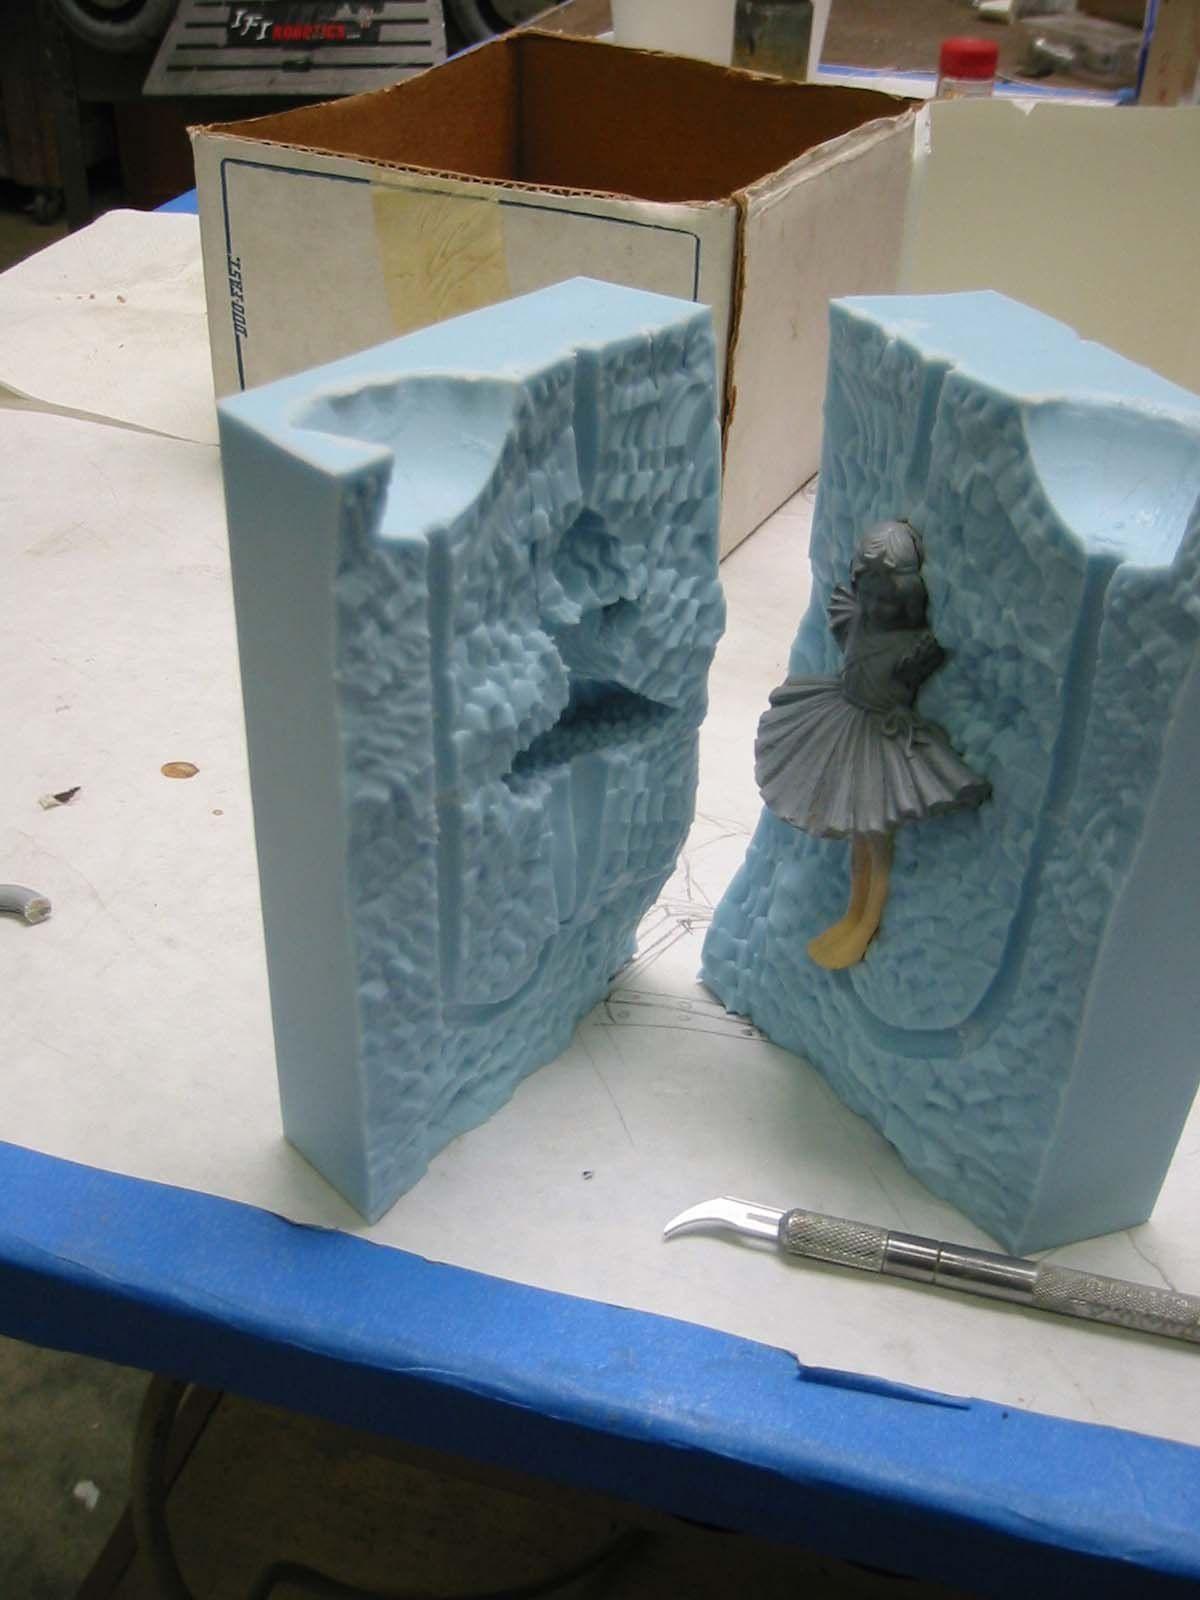 Primer — Moldmaking | Stump | Diy molding, Plaster art, Diy silicone